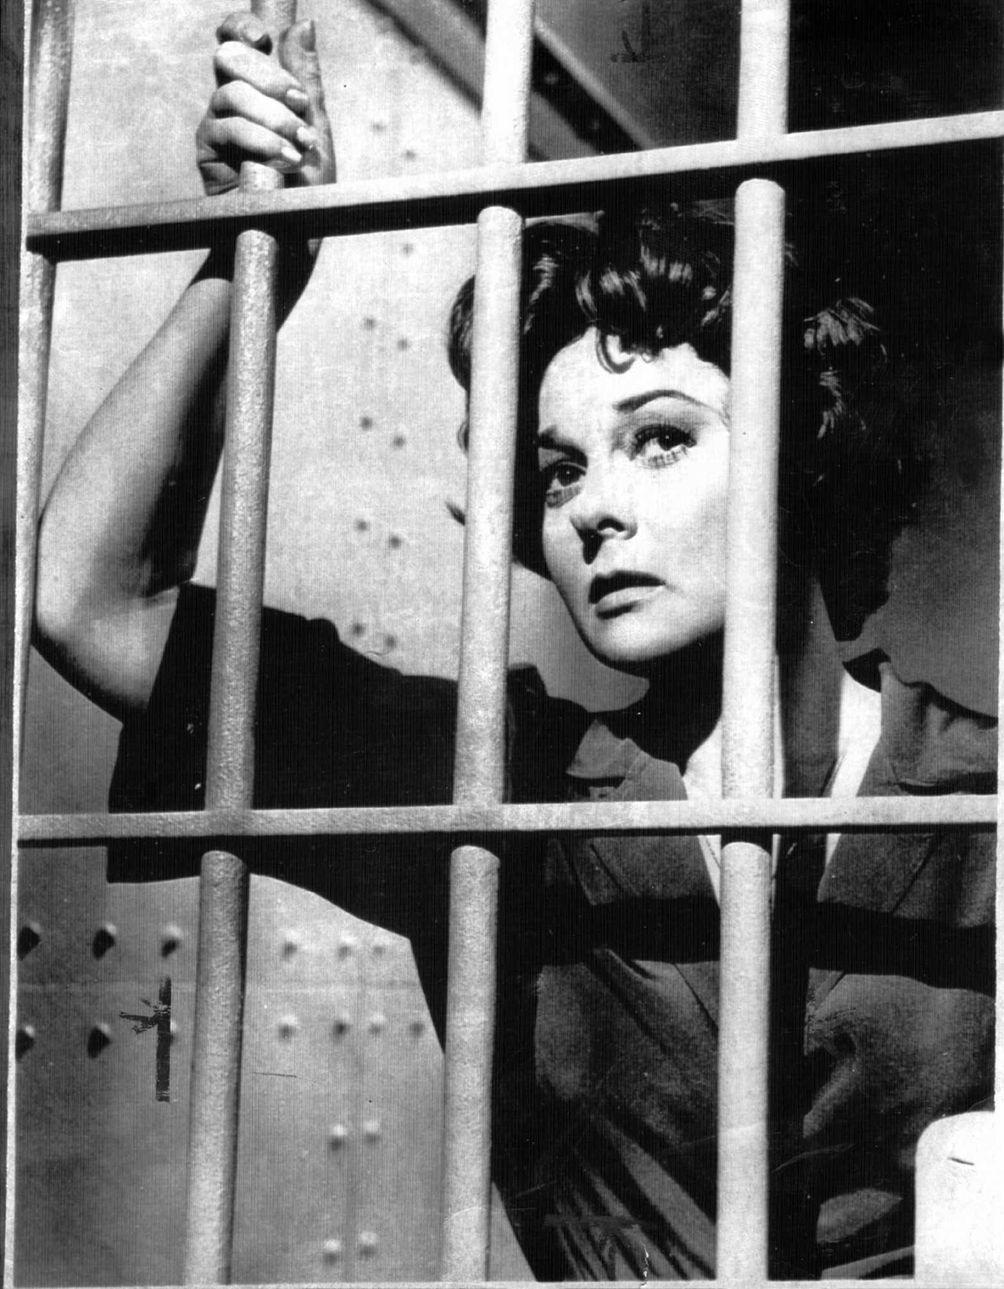 1958 - Susan Hayward - I Want To